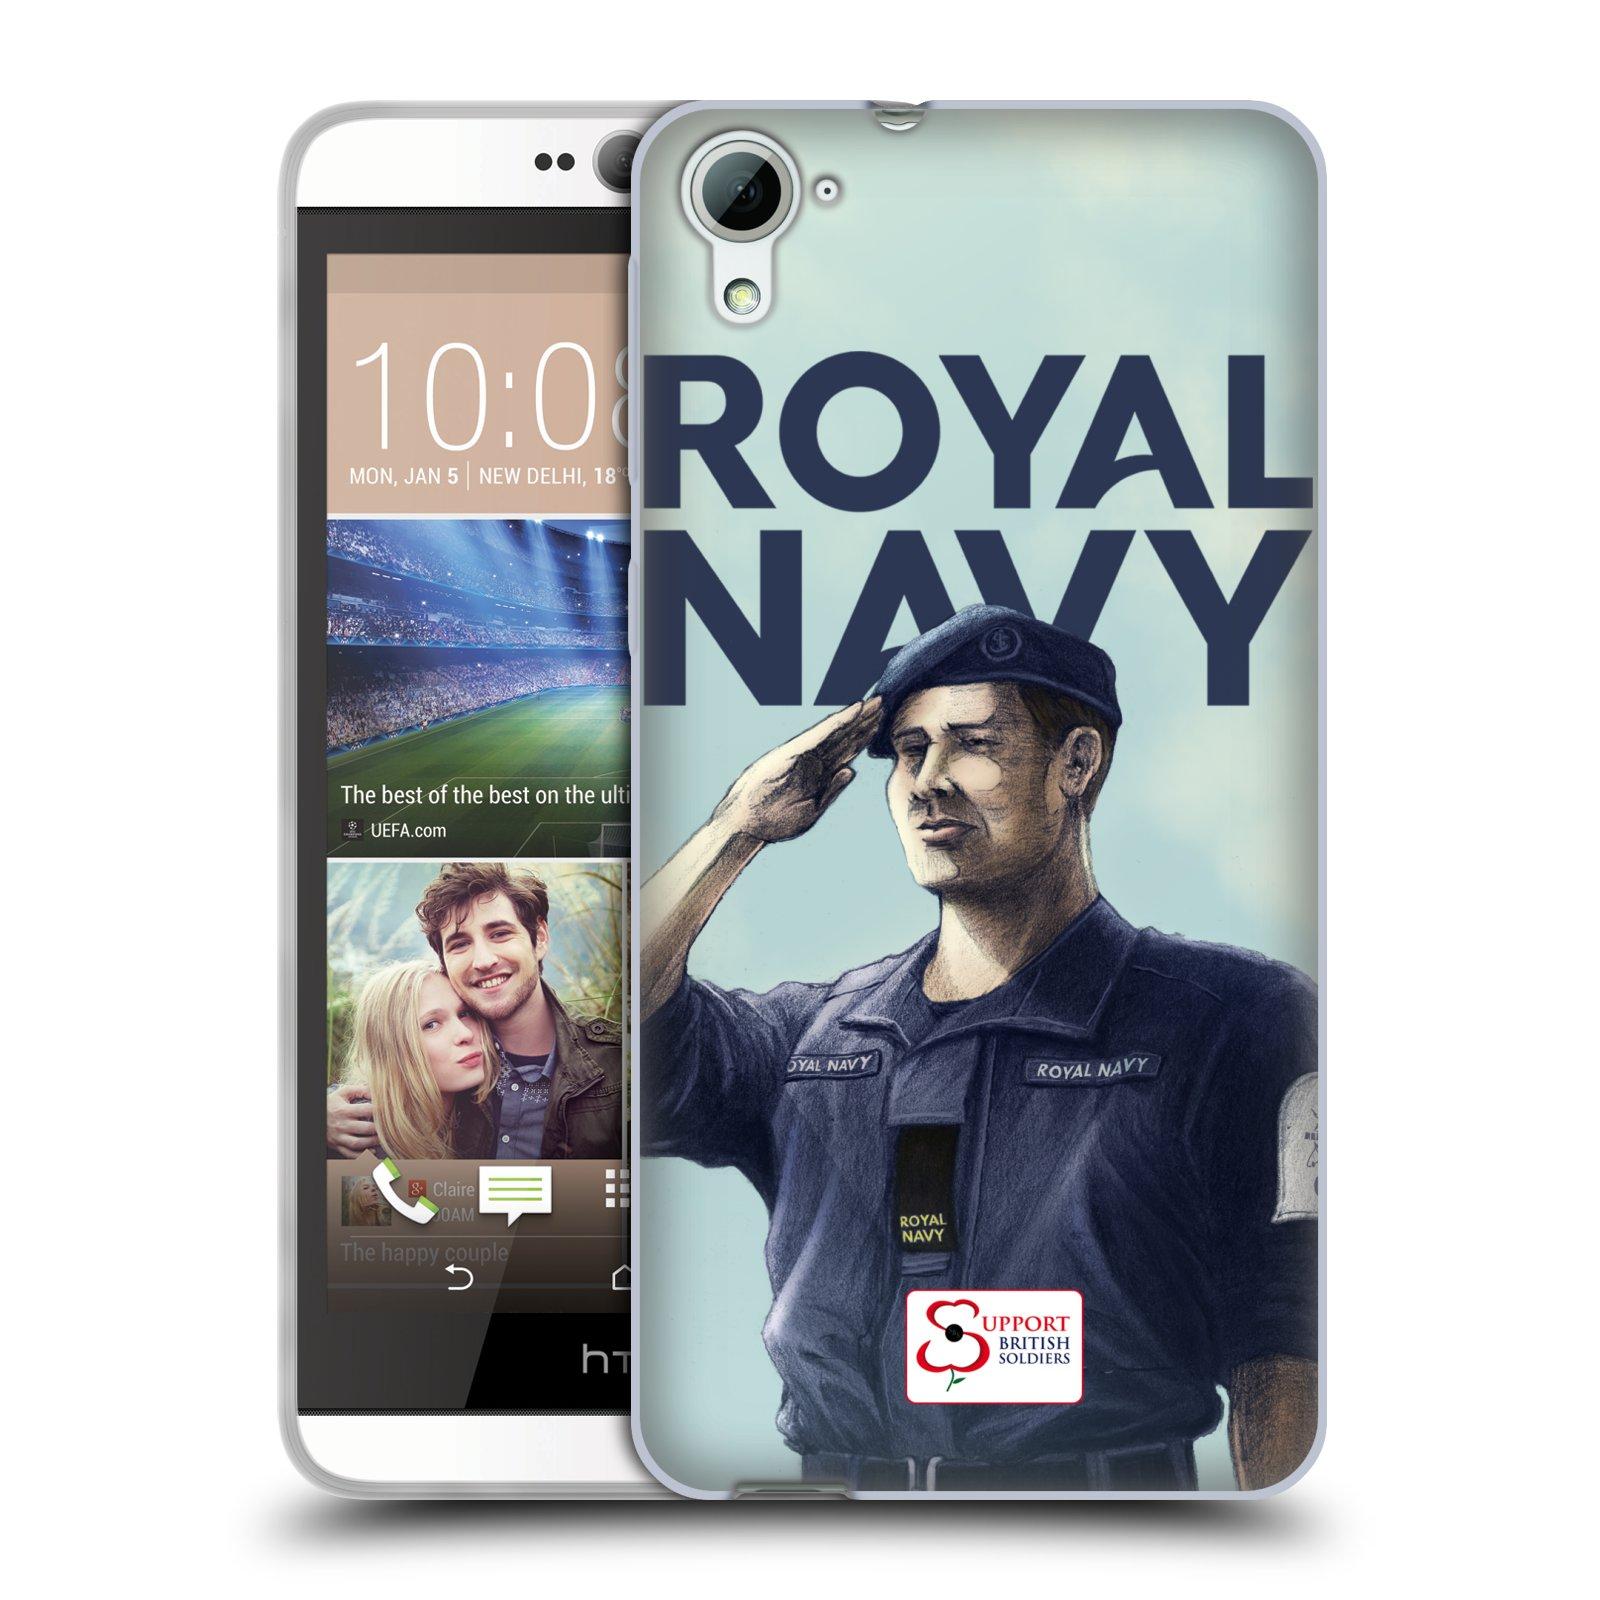 Silikonové pouzdro na mobil HTC Desire 826 HEAD CASE ROYAL NAVY (Silikonový kryt či obal na mobilní telefon HTC Desire 826 Dual SIM)